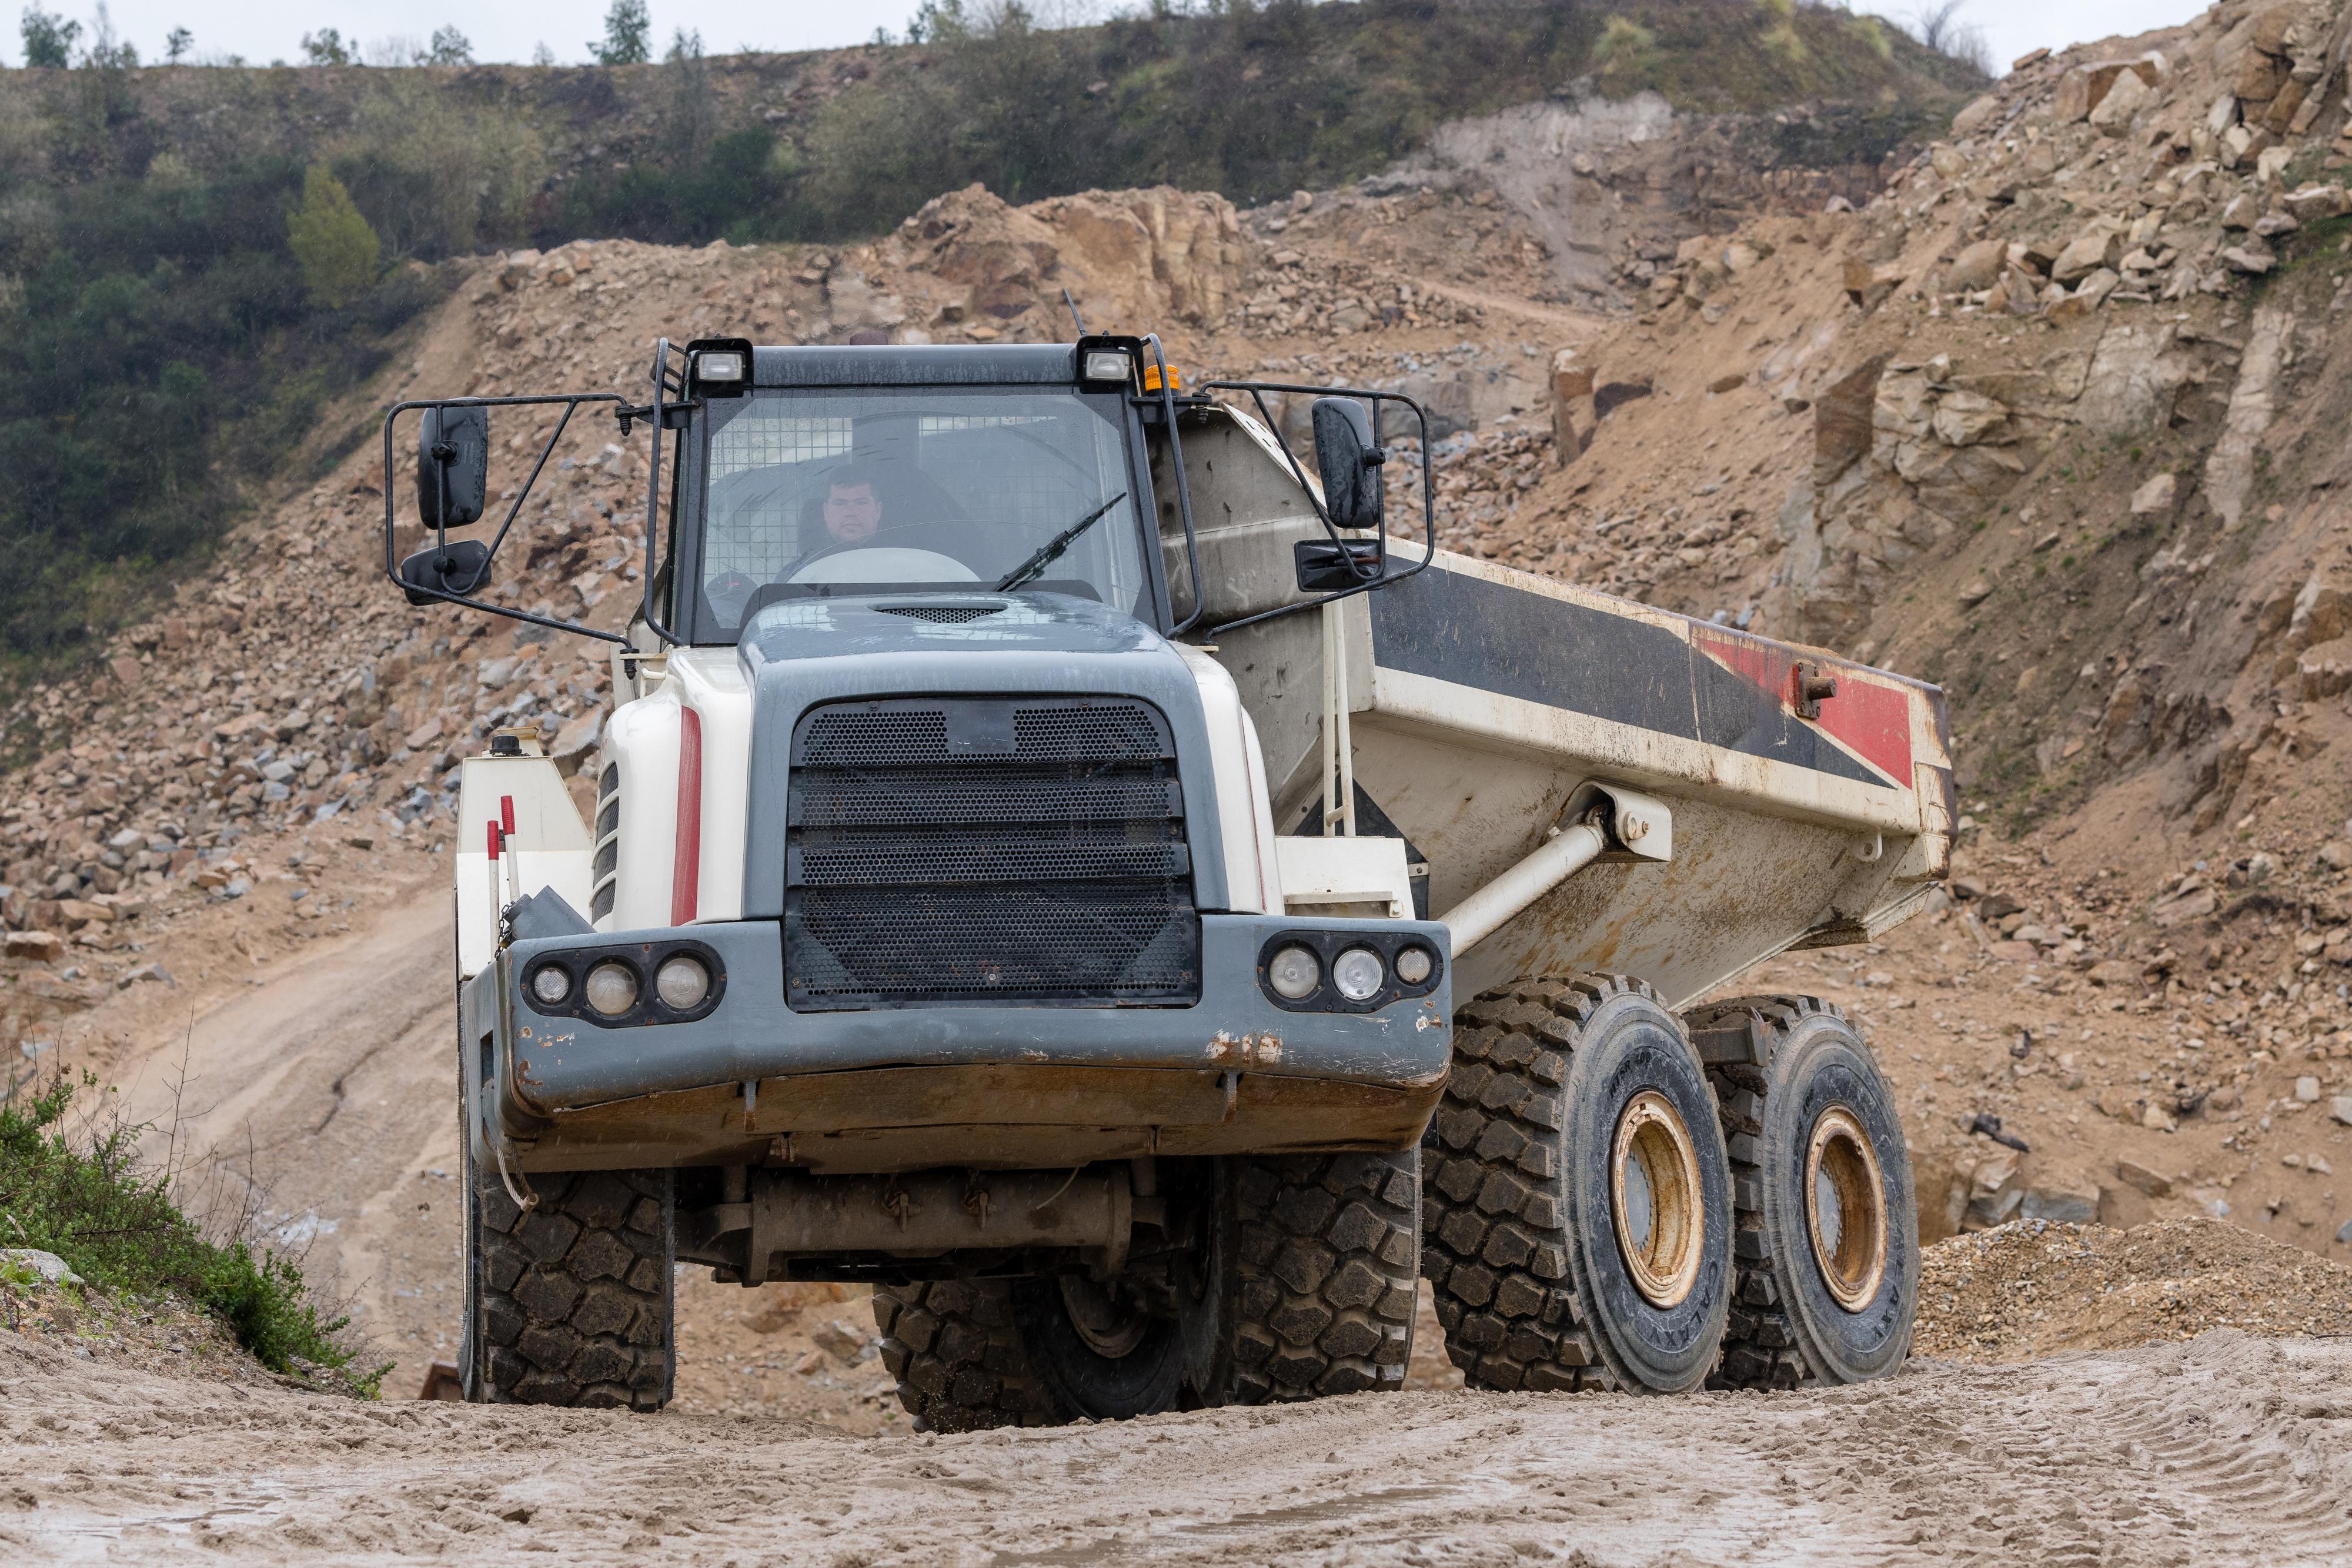 Galaxy HTSR 400 - Dump Truck